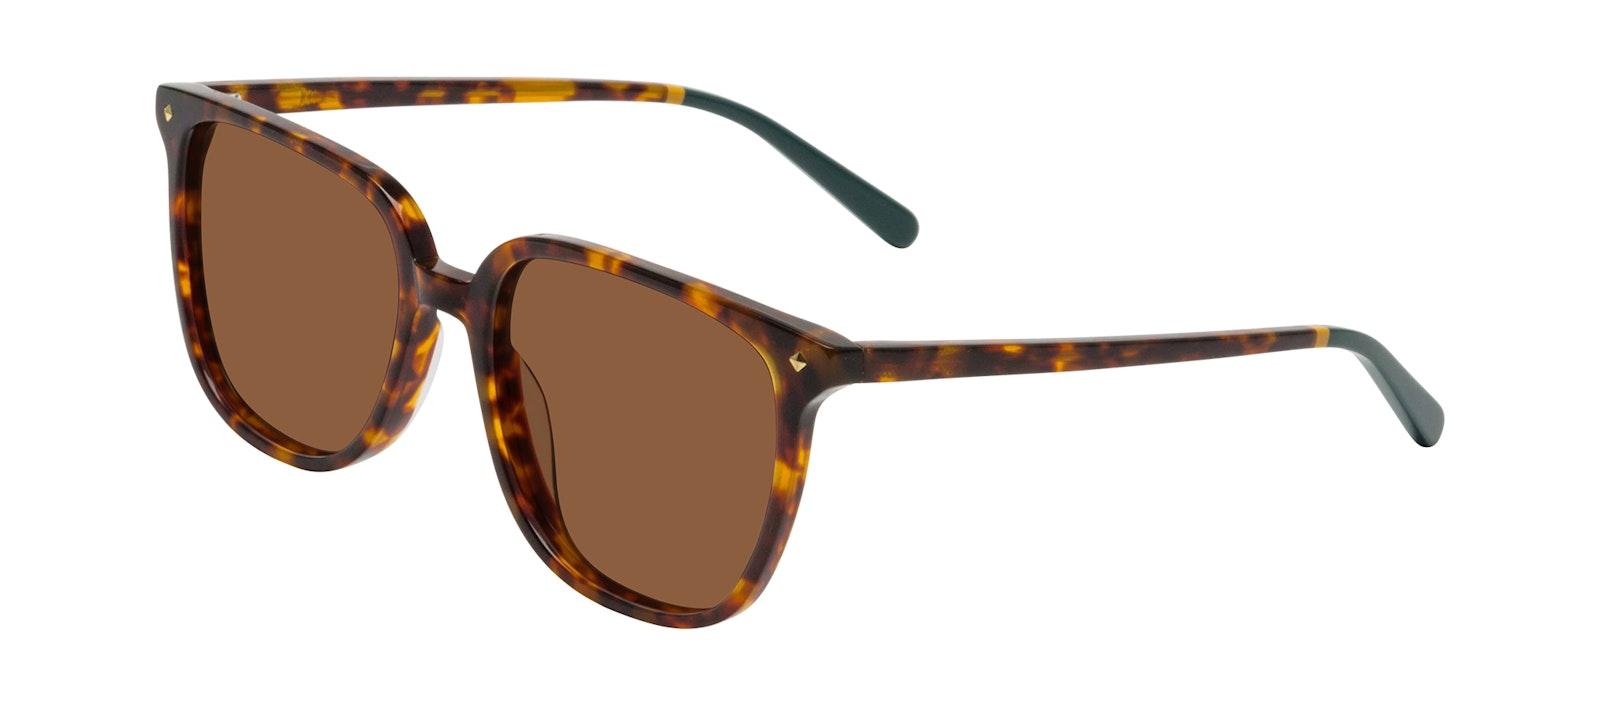 Affordable Fashion Glasses Sunglasses Women Gia Tortoise Tilt